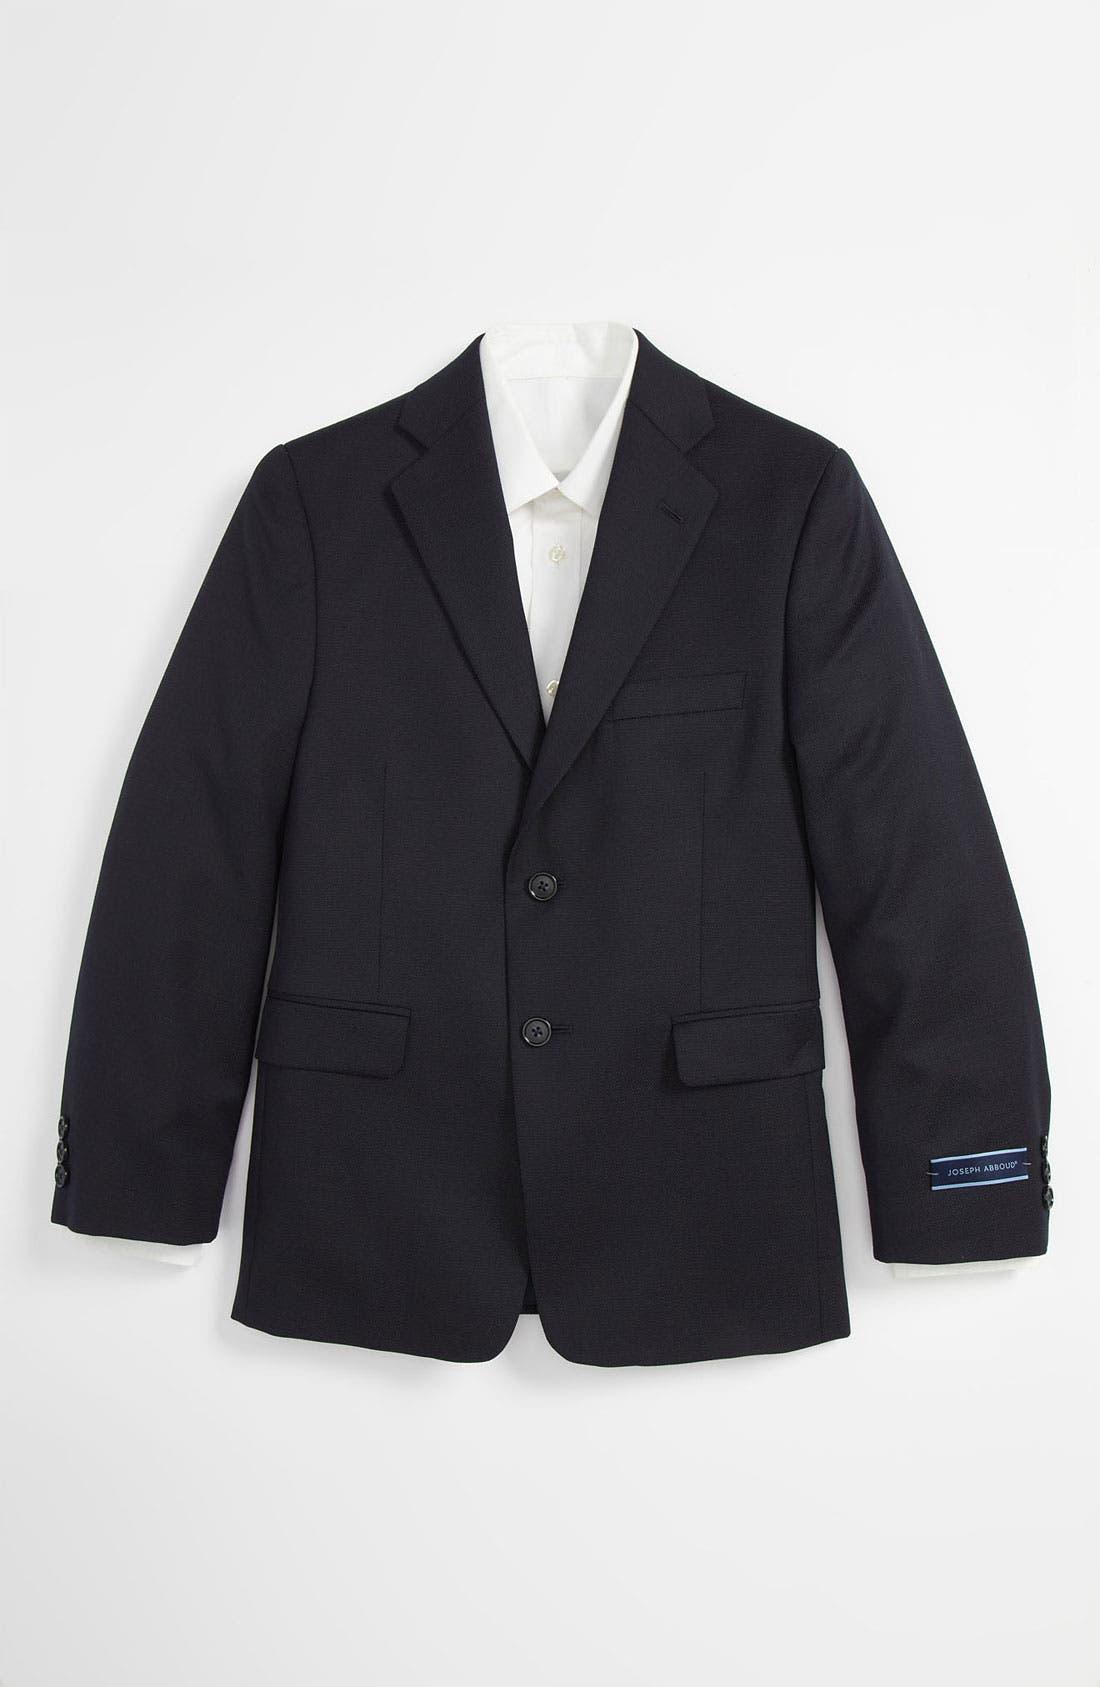 Alternate Image 1 Selected - Joseph Abboud Suit Blazer (Big Boys)